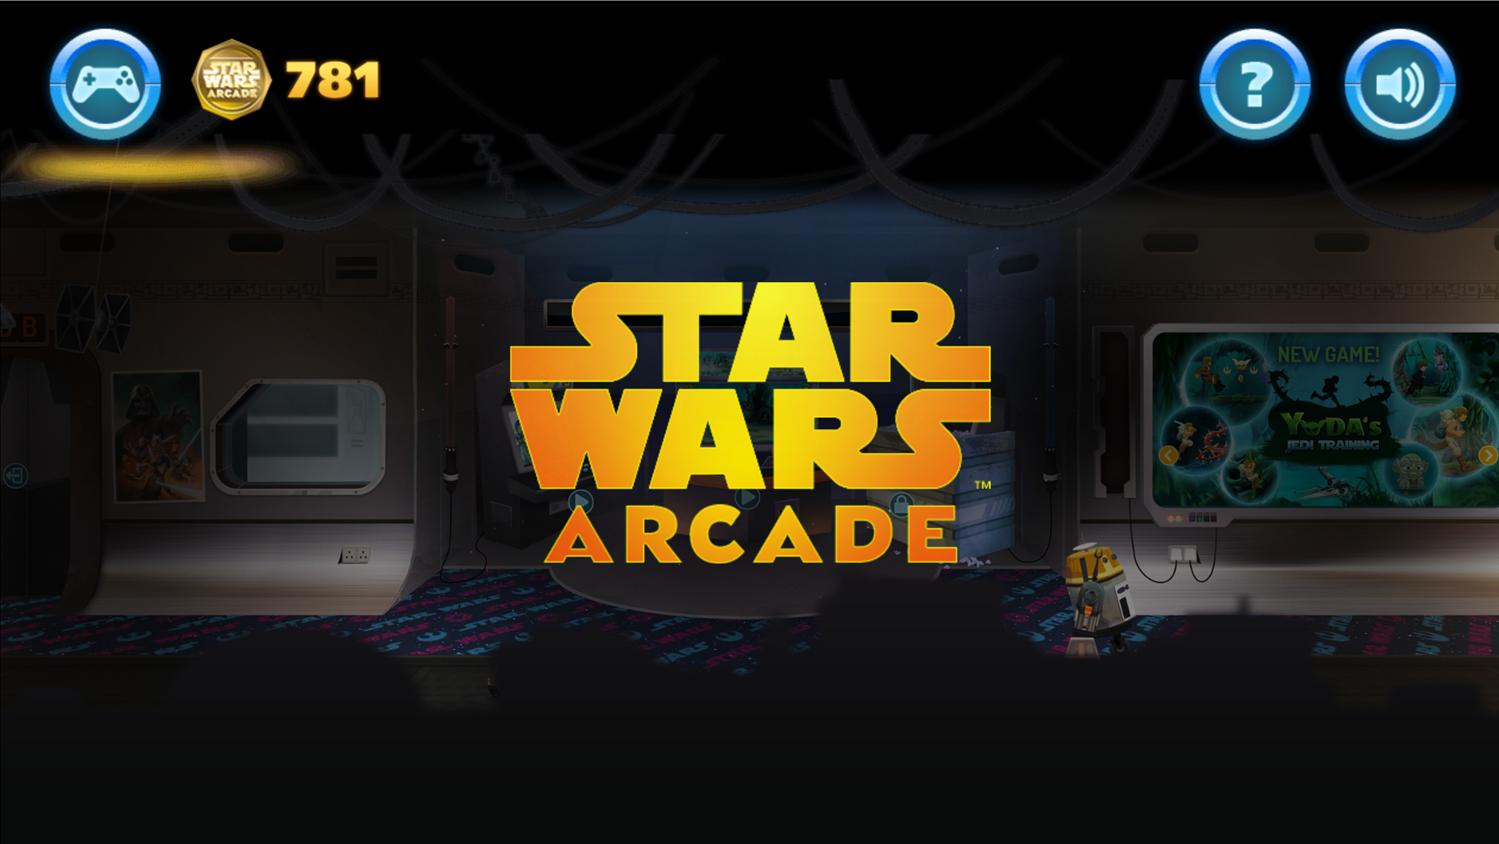 Star Wars Arcade Welcome Screen Screenshot.